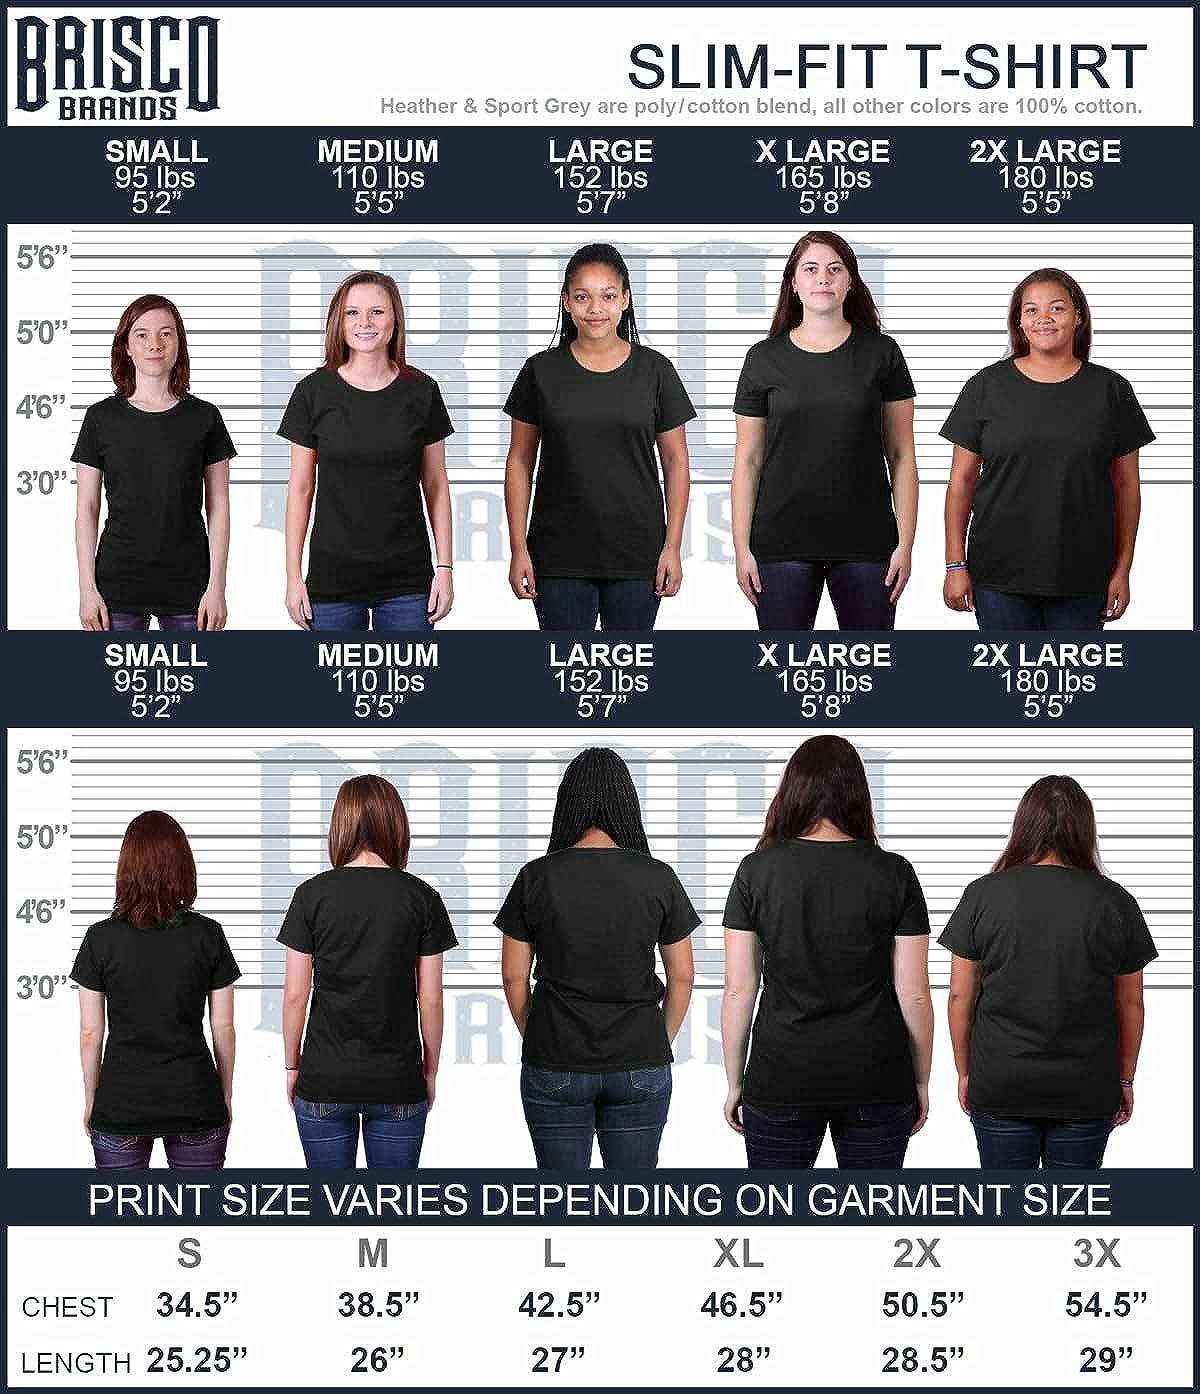 Classic Teaze Alabama Souvenir Tourist Sport Gym Workout Ladies T Shirt 617YYI8H7ZL